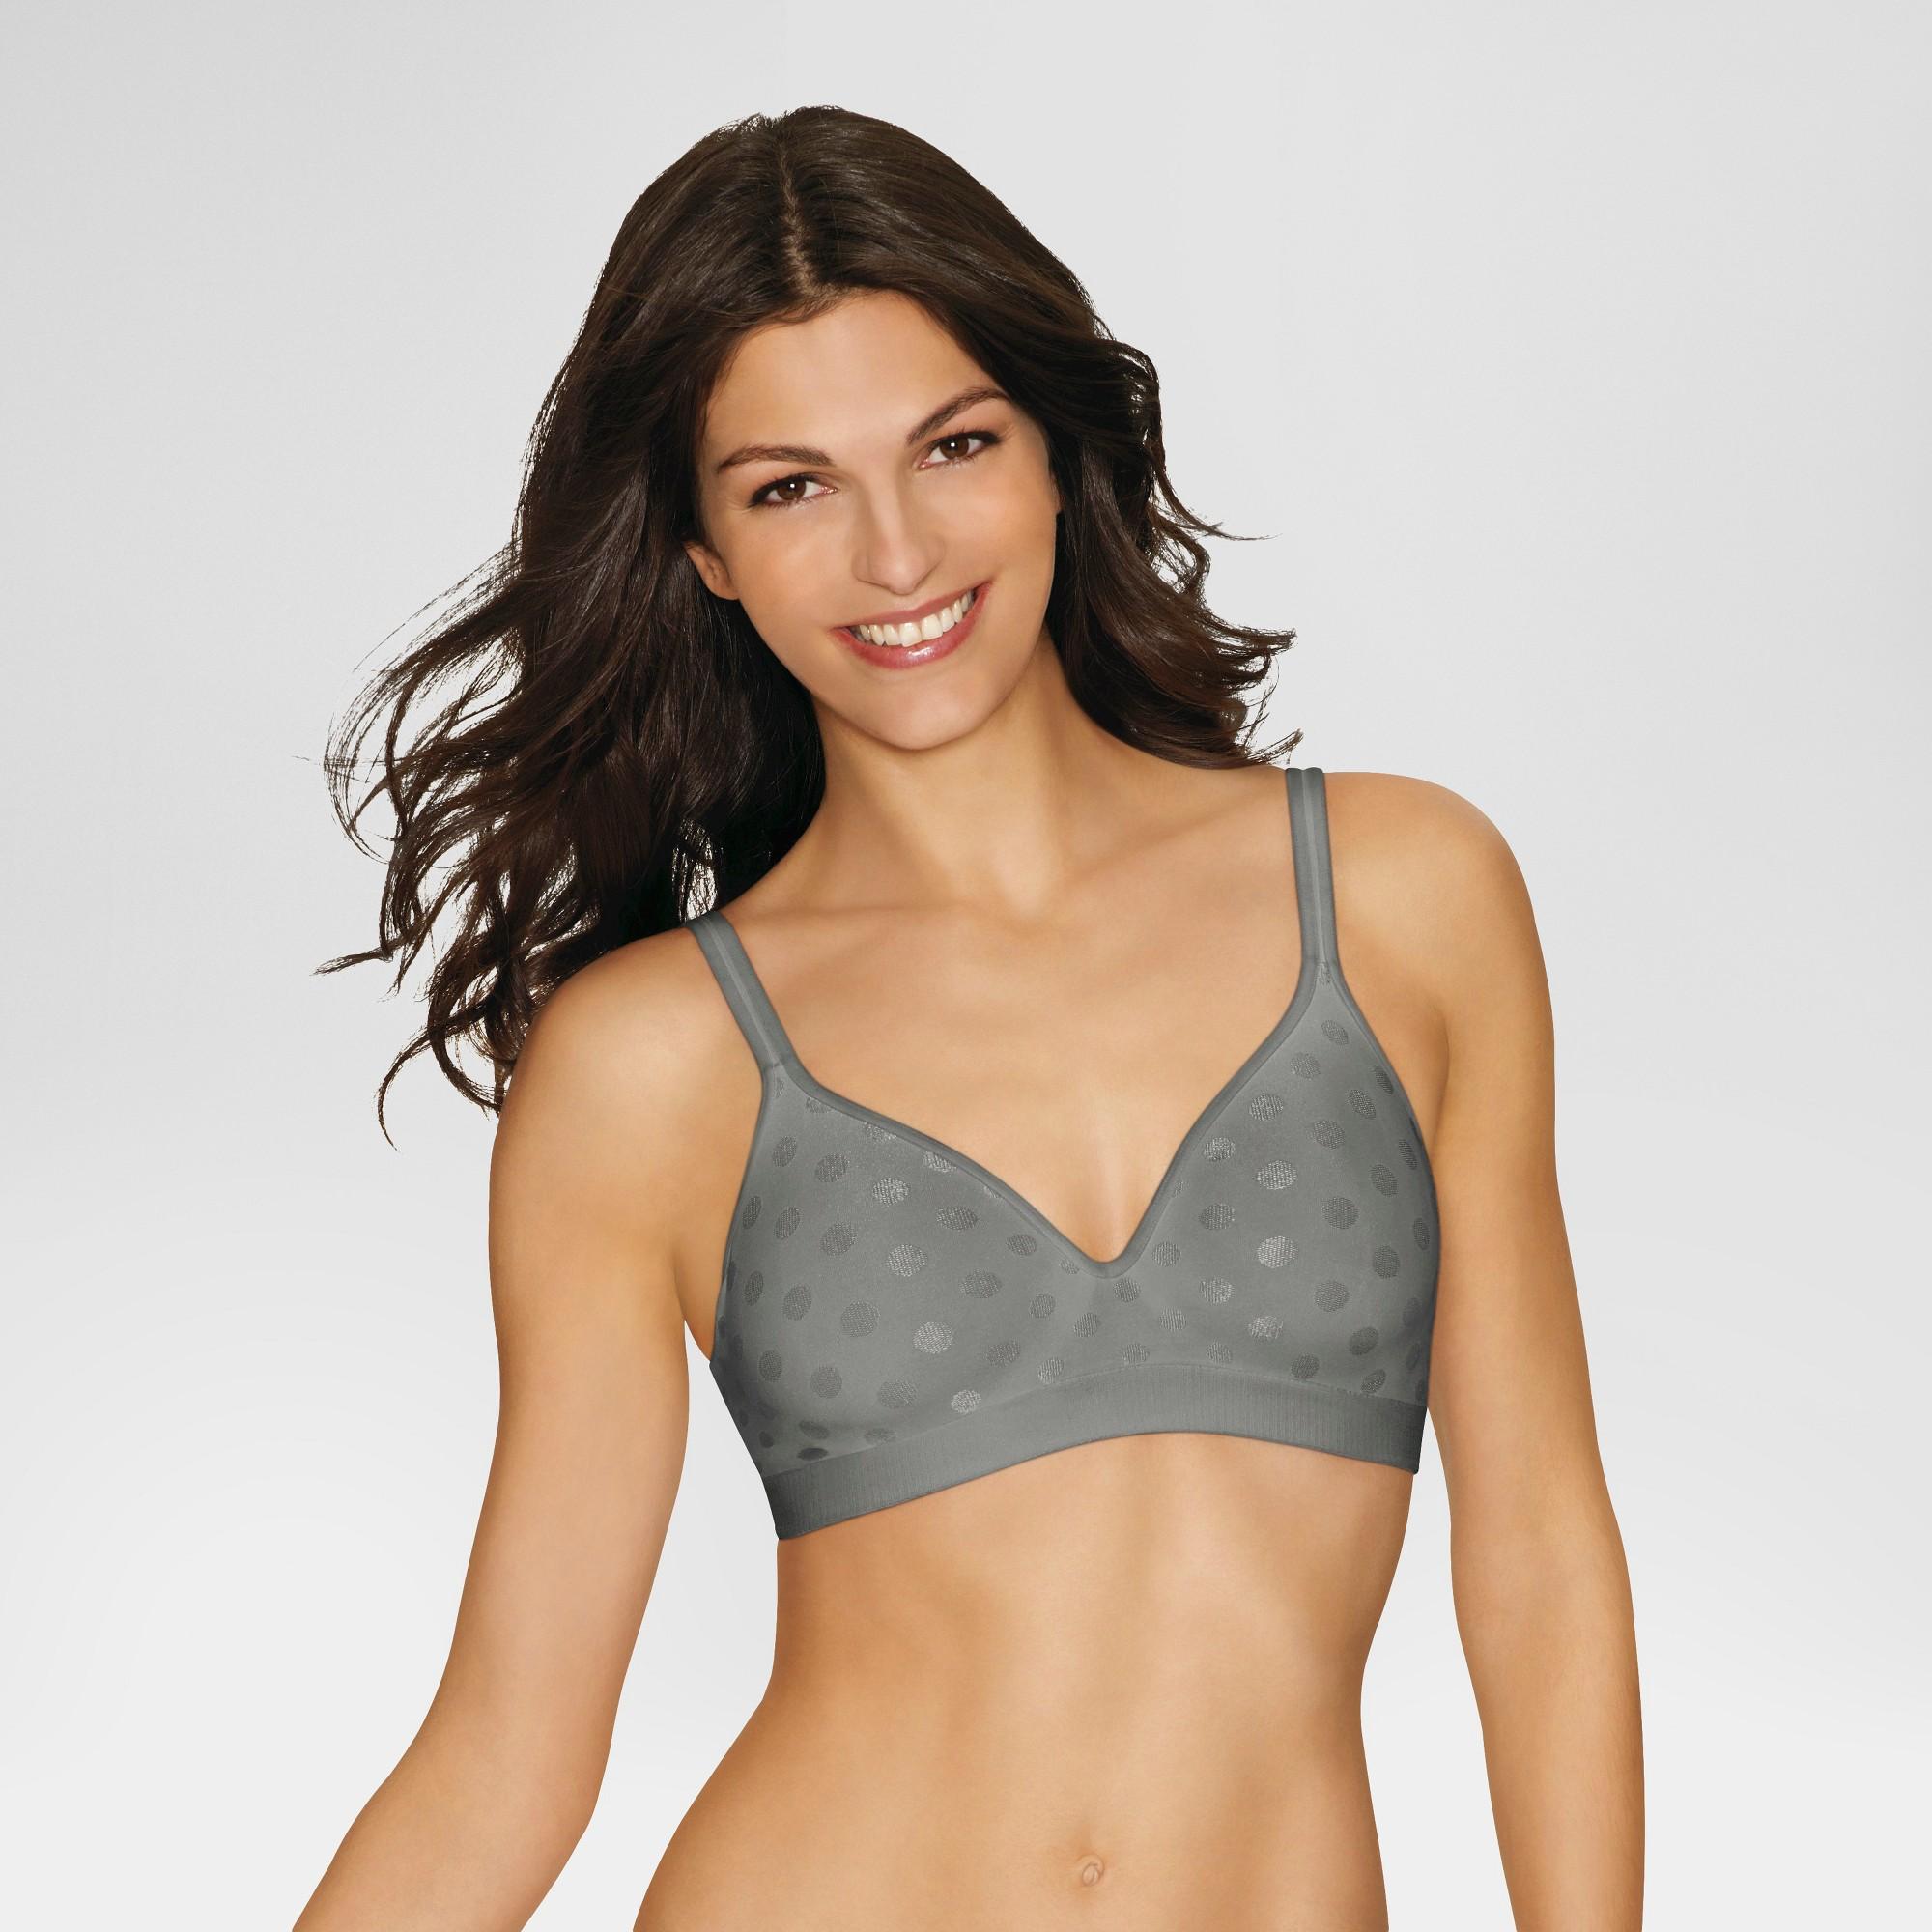 comforter shld free womens fit url getimage women invisible s ultimate shop wire comfort flex bra hanes look